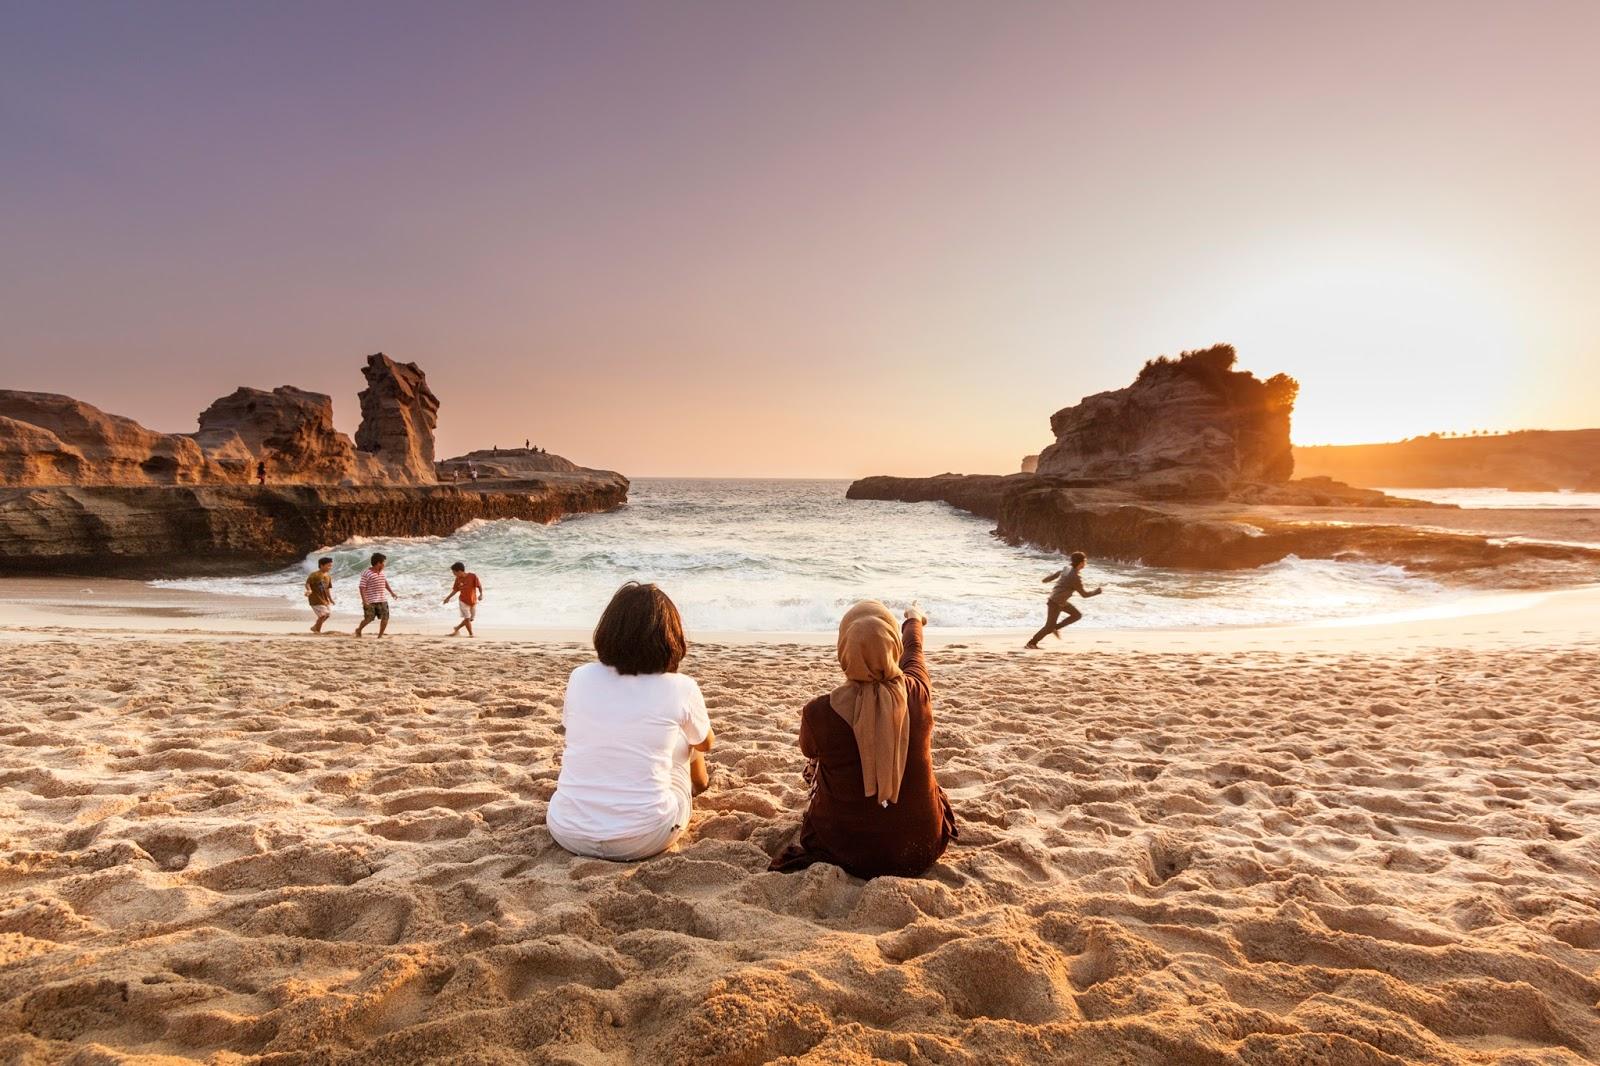 17 Pantai Elok Sepanjang Perairan Pacitan Pacitanku Kabupaten Teleng Ria